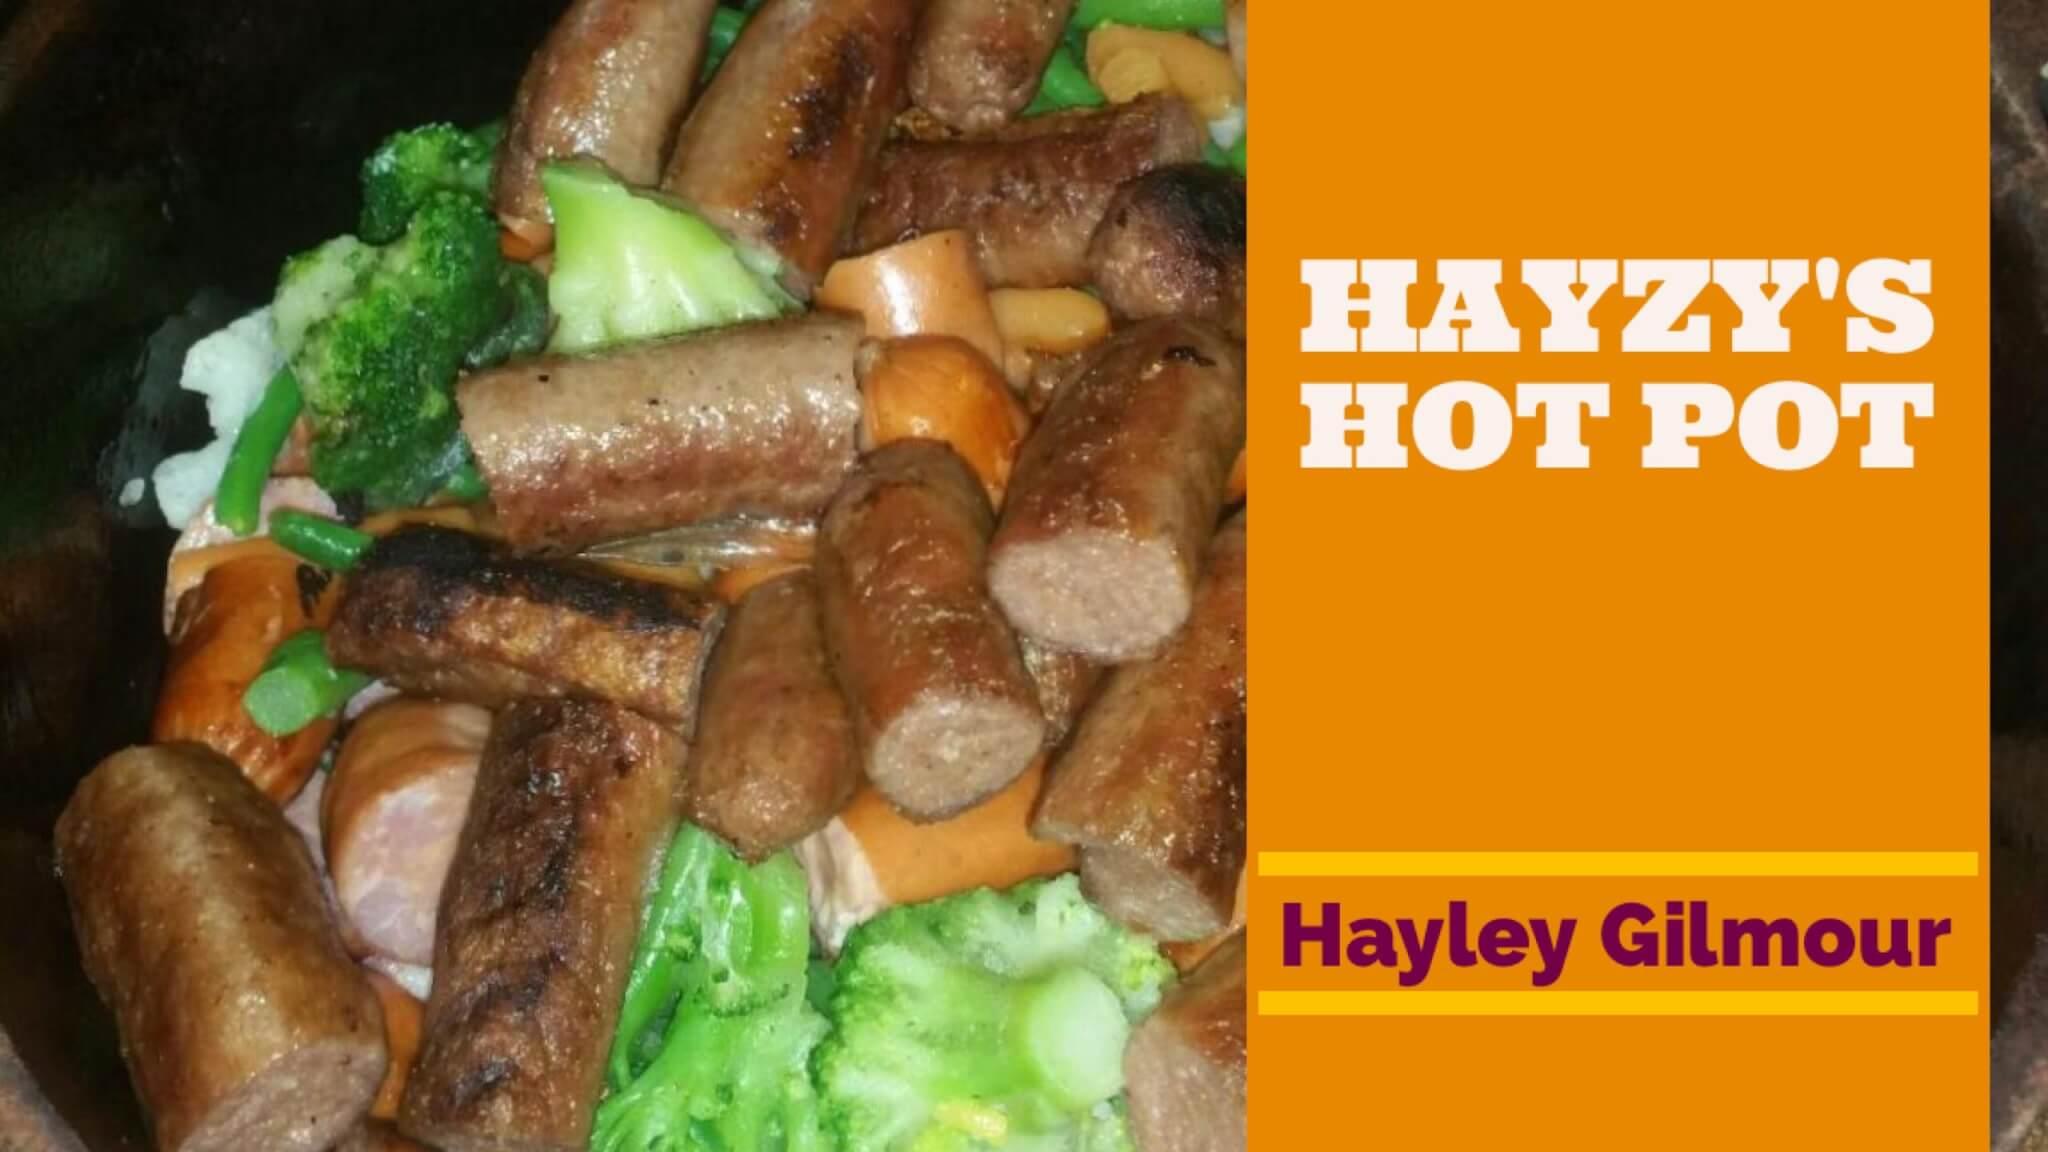 Hayzy's Camp Oven Hotpot | Hayley Gilmour